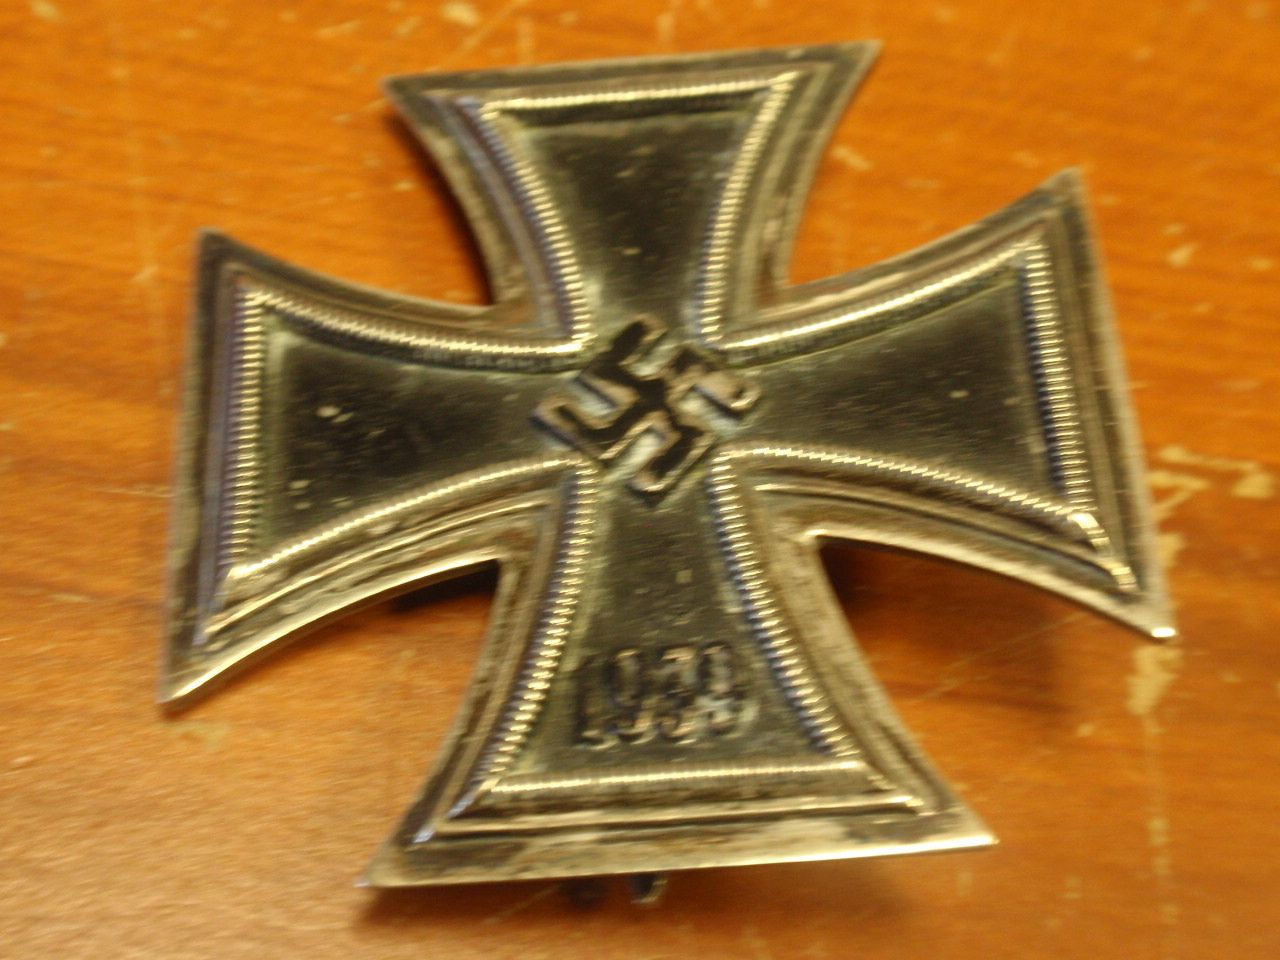 Time Traveler Militaria - WW2 German Iron Cross Medal   My Wish List